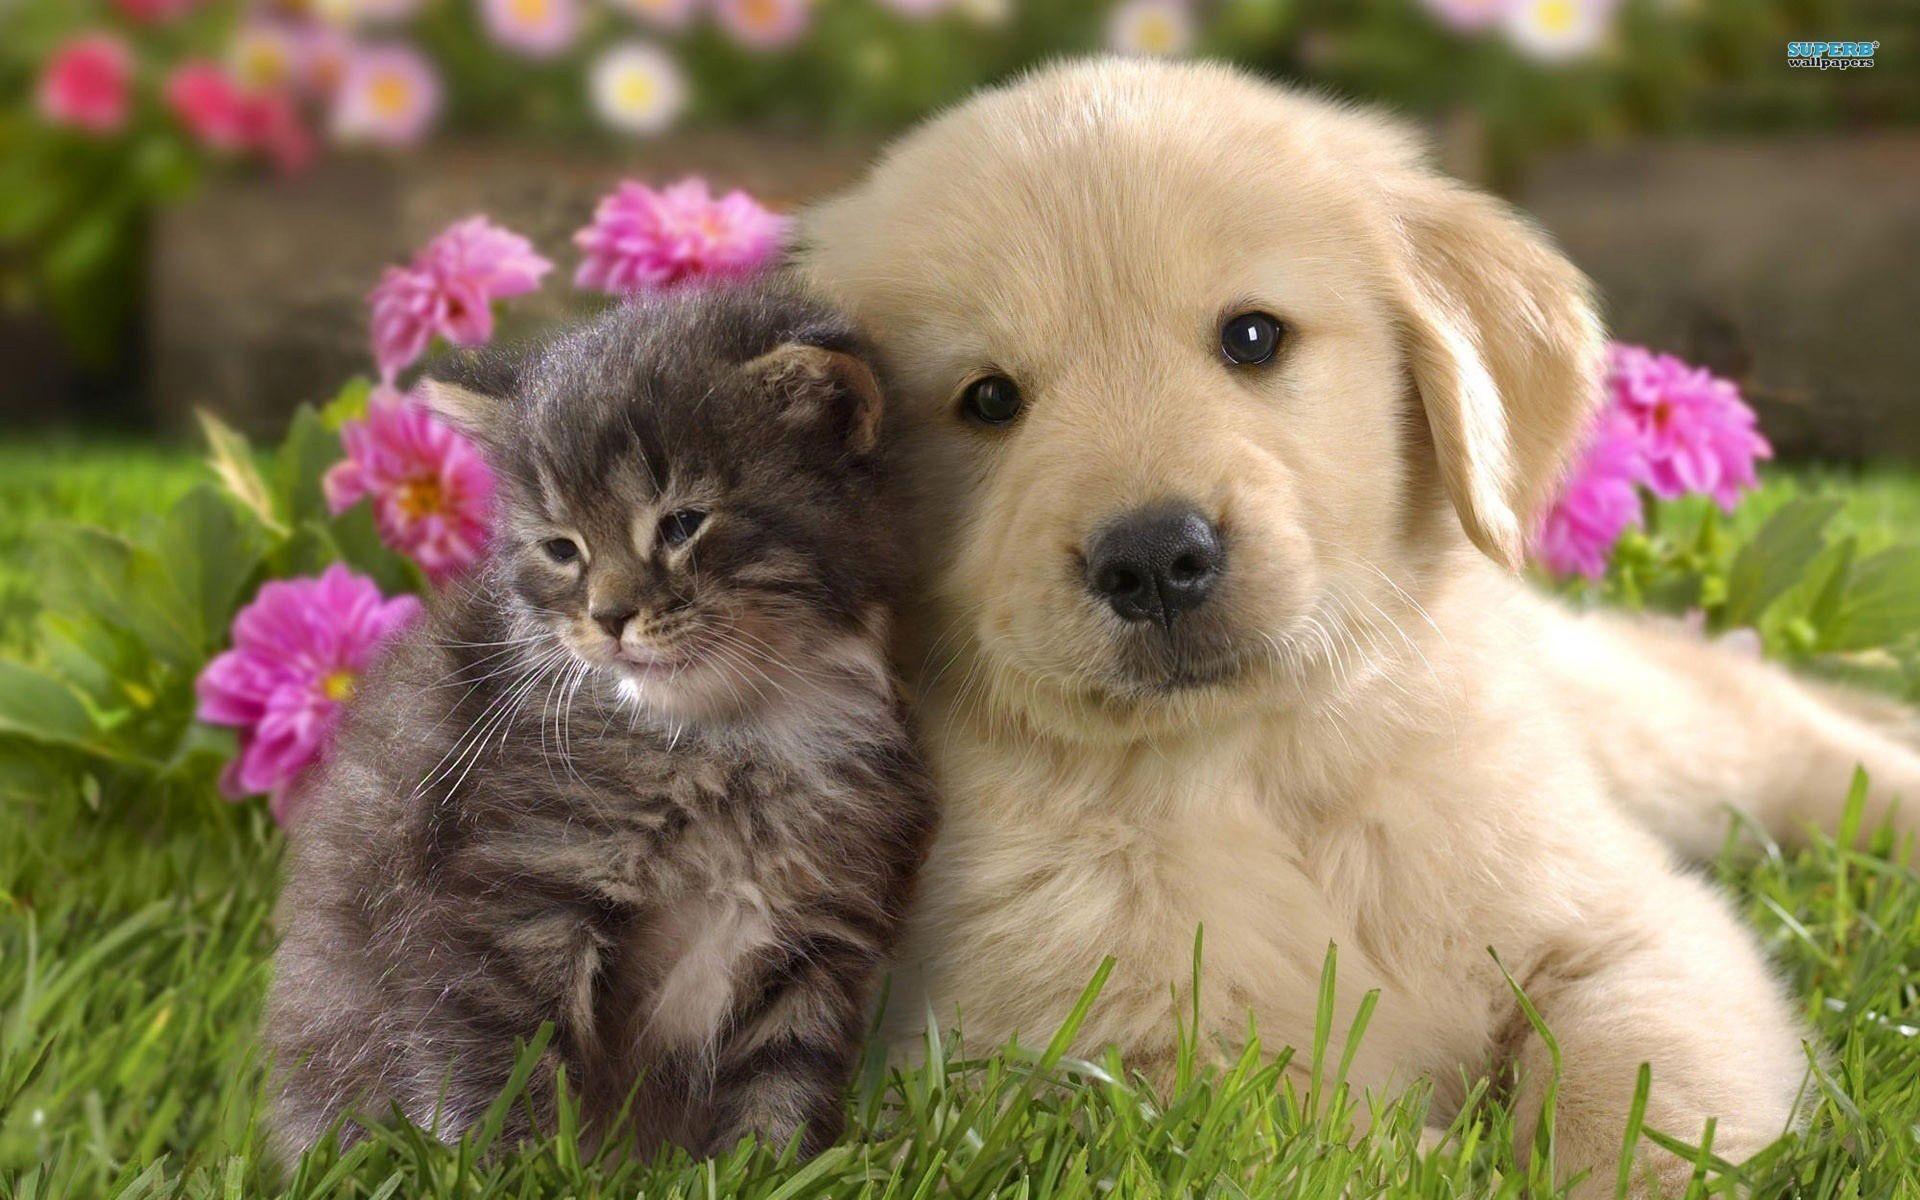 Yellow Labrador Puppy Wallpaper Px Free Download .